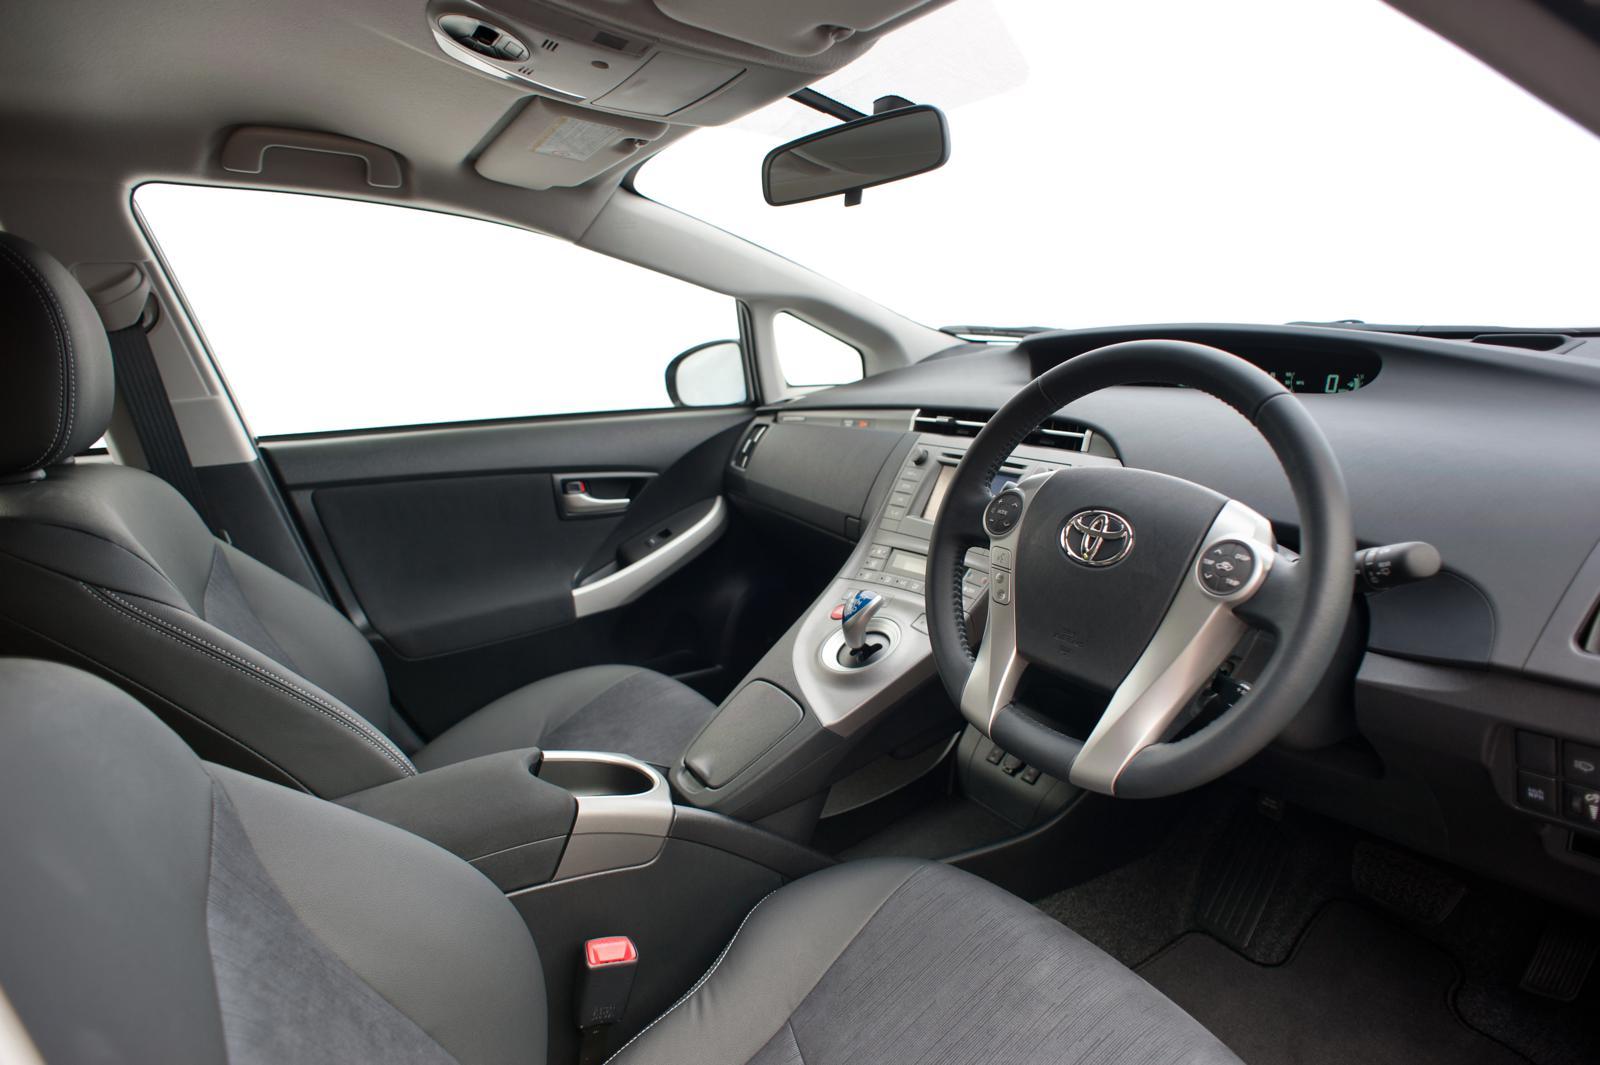 Toyota Prius Plug In 2012 Interior Front Seat Driver